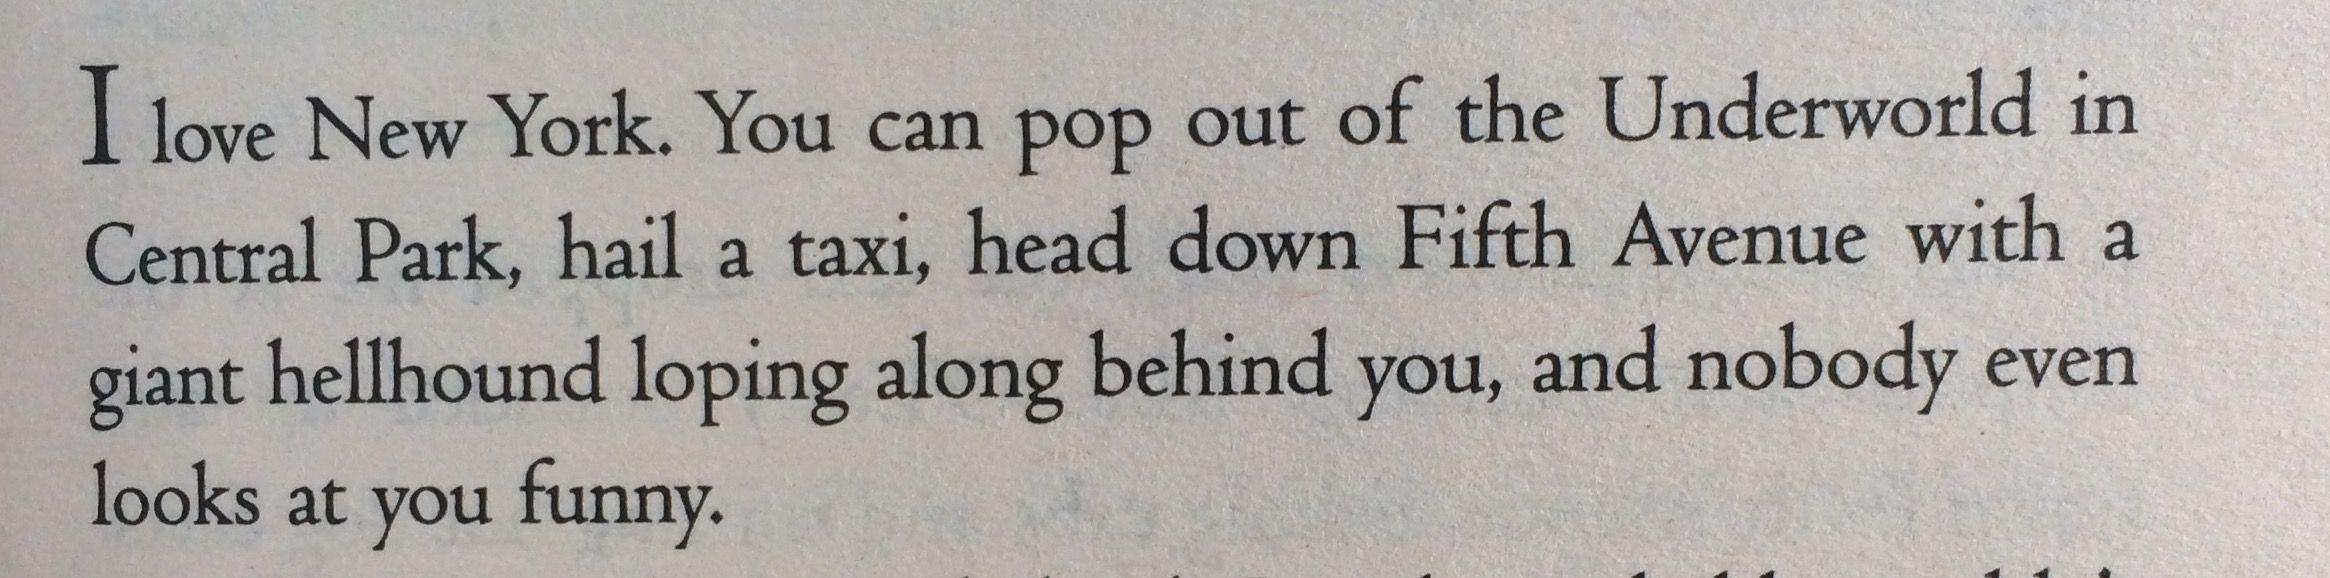 Percy Jackson The Last Olympian Quote Percy Jackson Quotes Percy Jackson Fandom Olympian Quotes